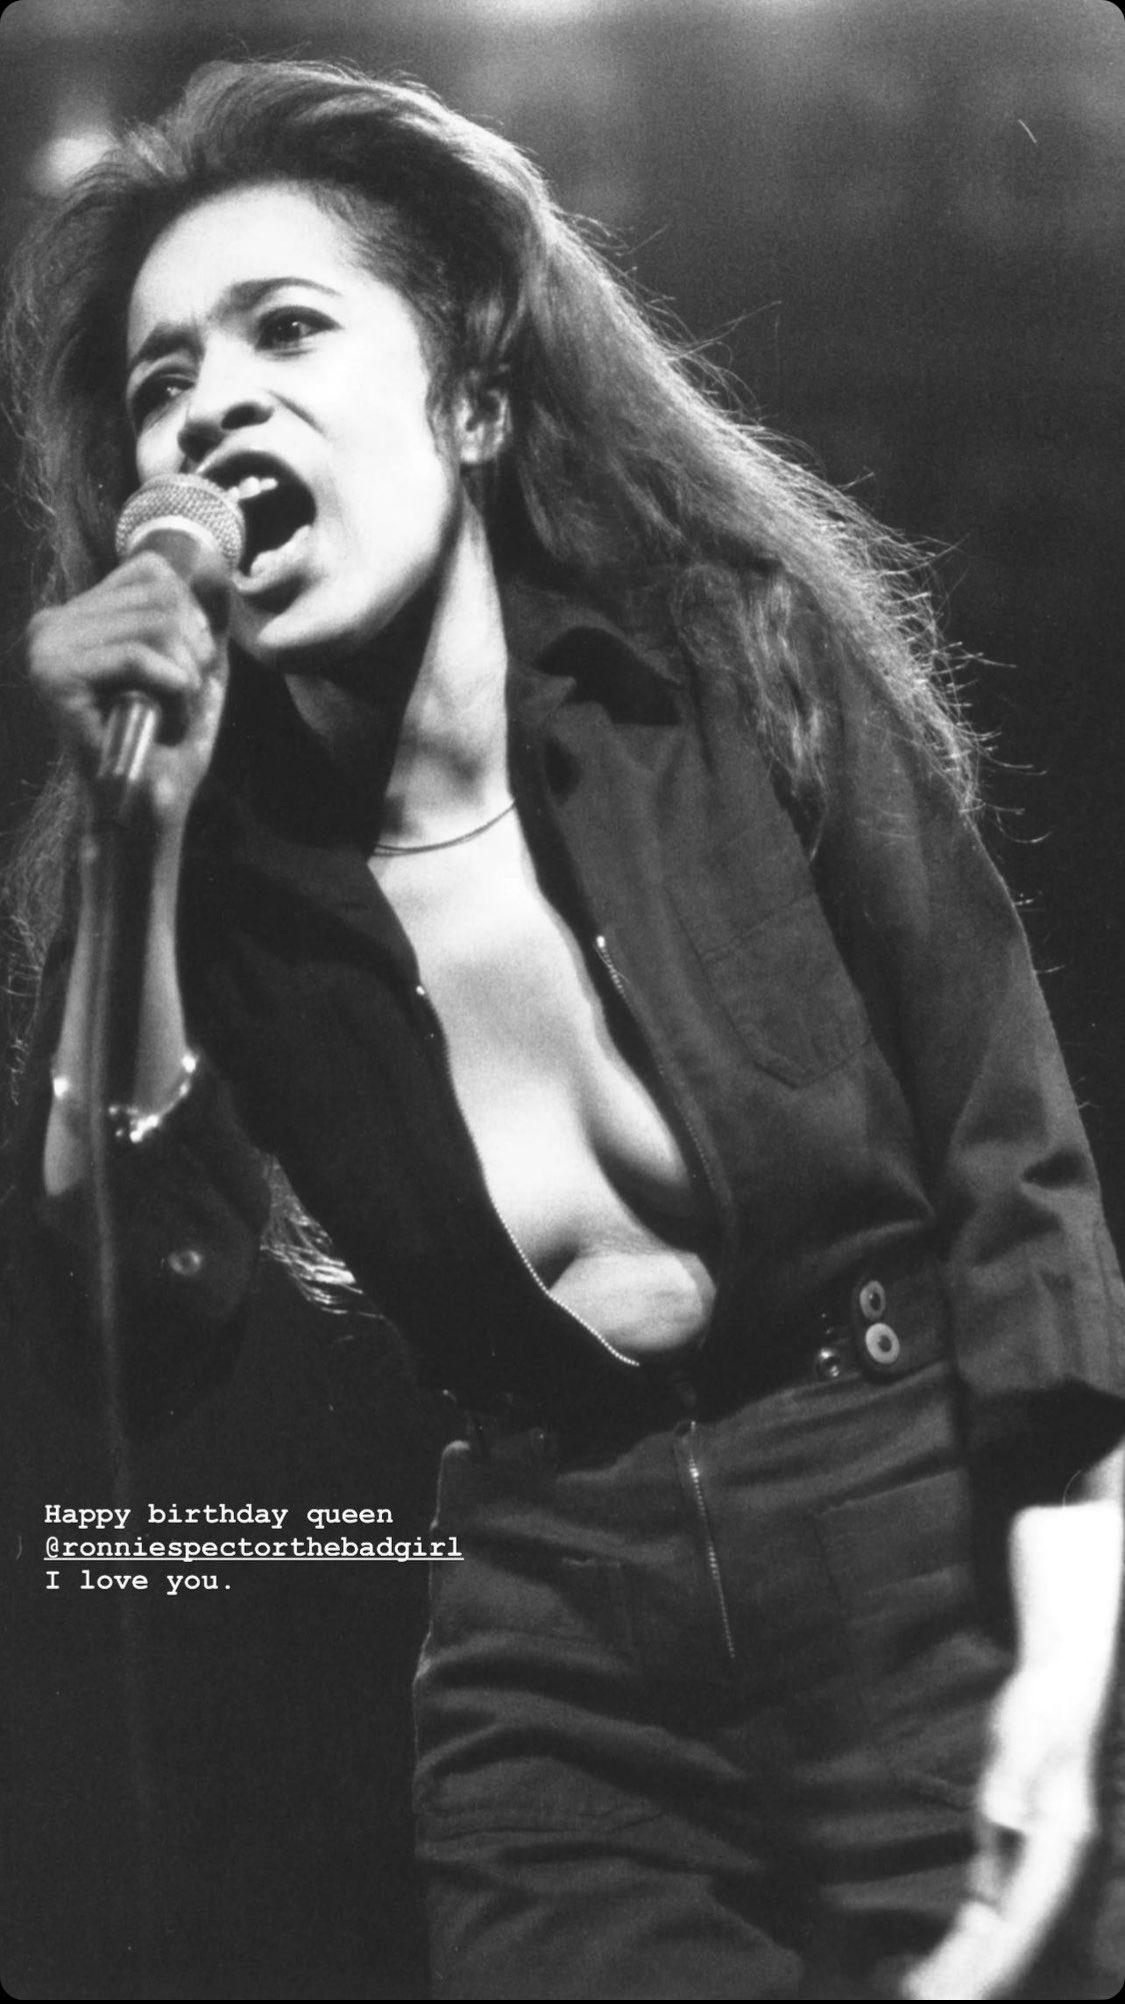 Zendaya wishes Ronnie Spector a Happy Birthday on her Instagram Stories